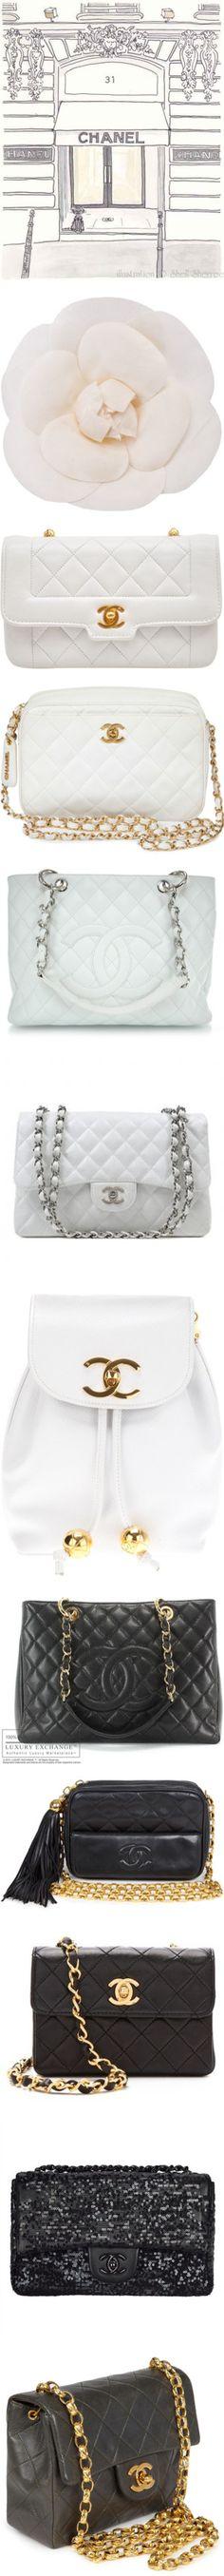 Chanel | Keep The Glamour ♡  ✤LadyLuxury✤